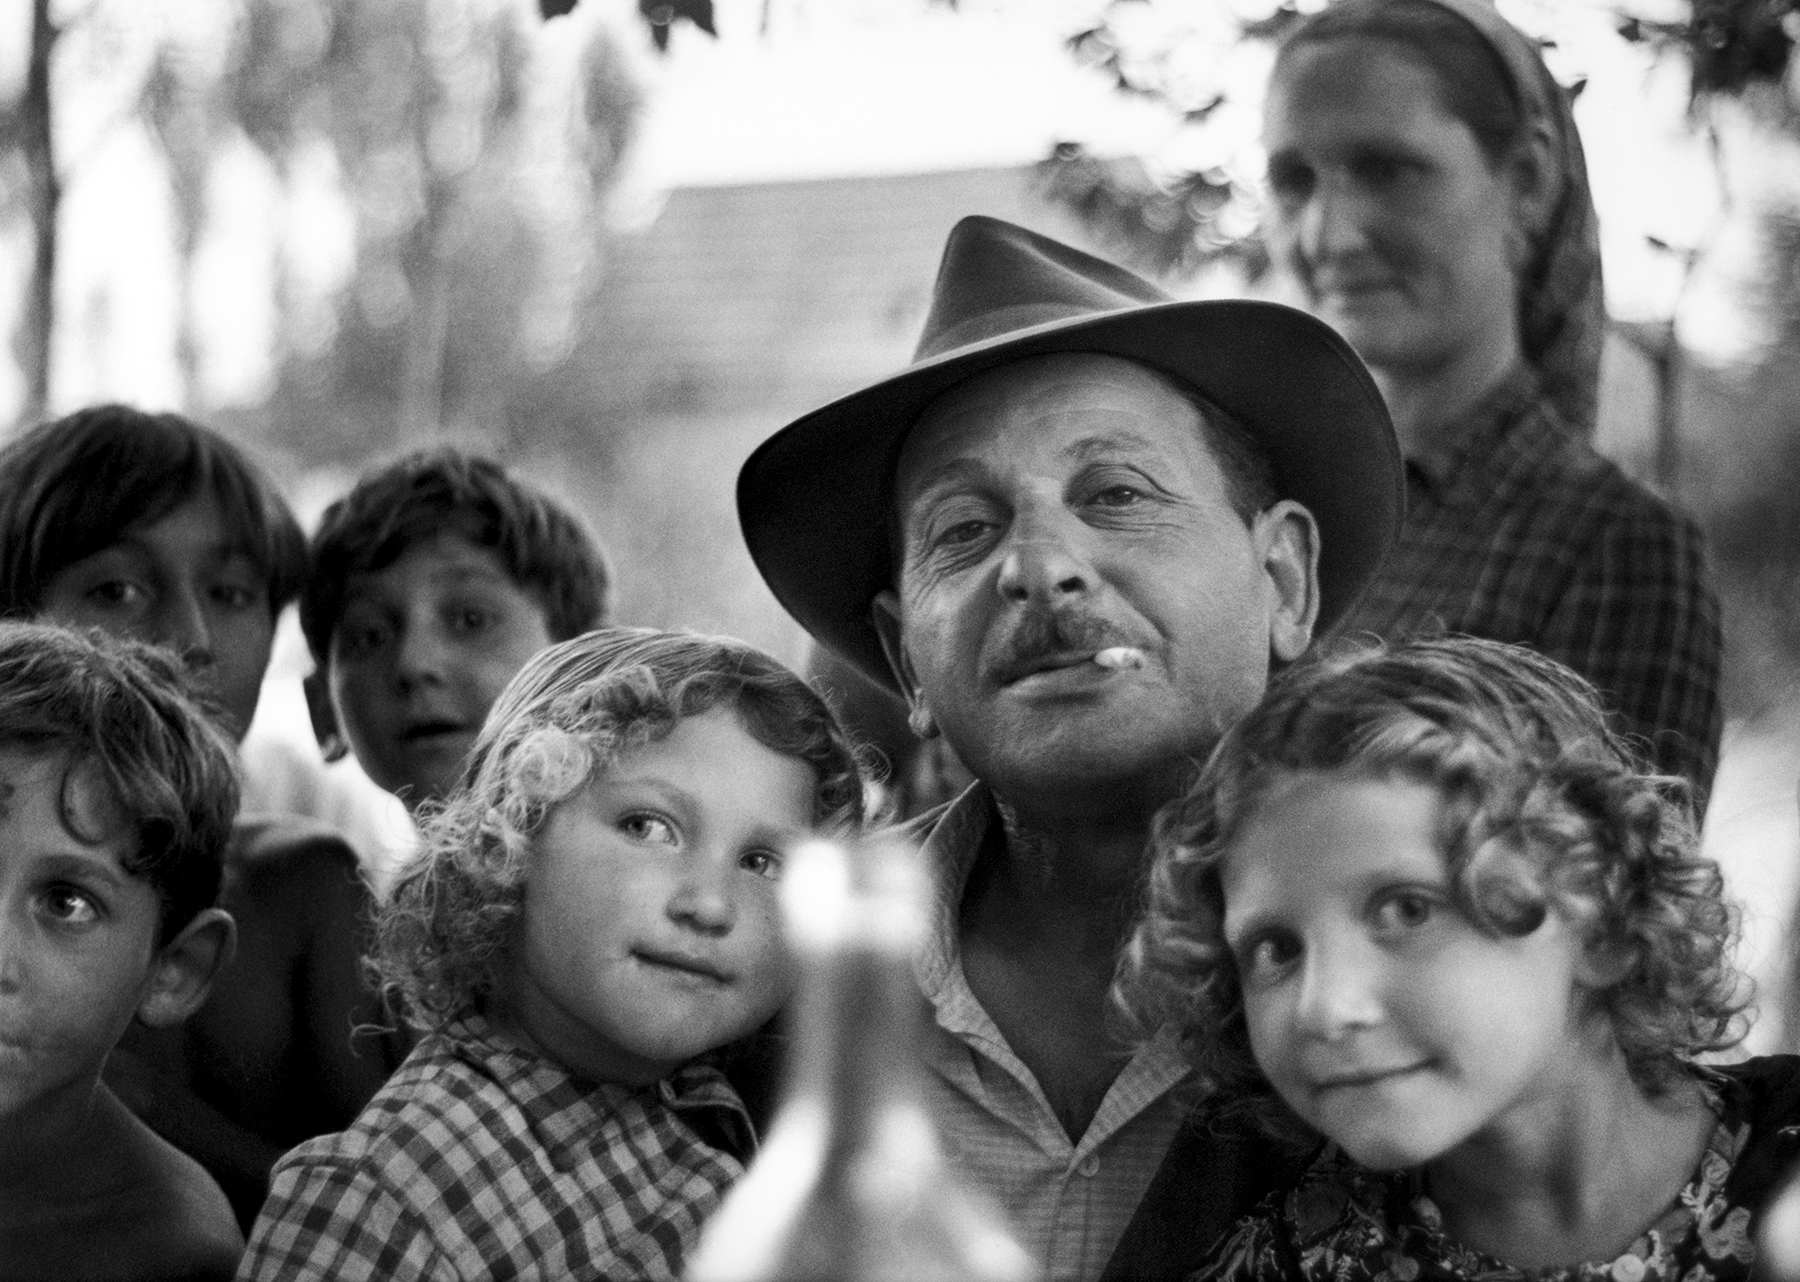 Untitled (Roma man holding children), 1967